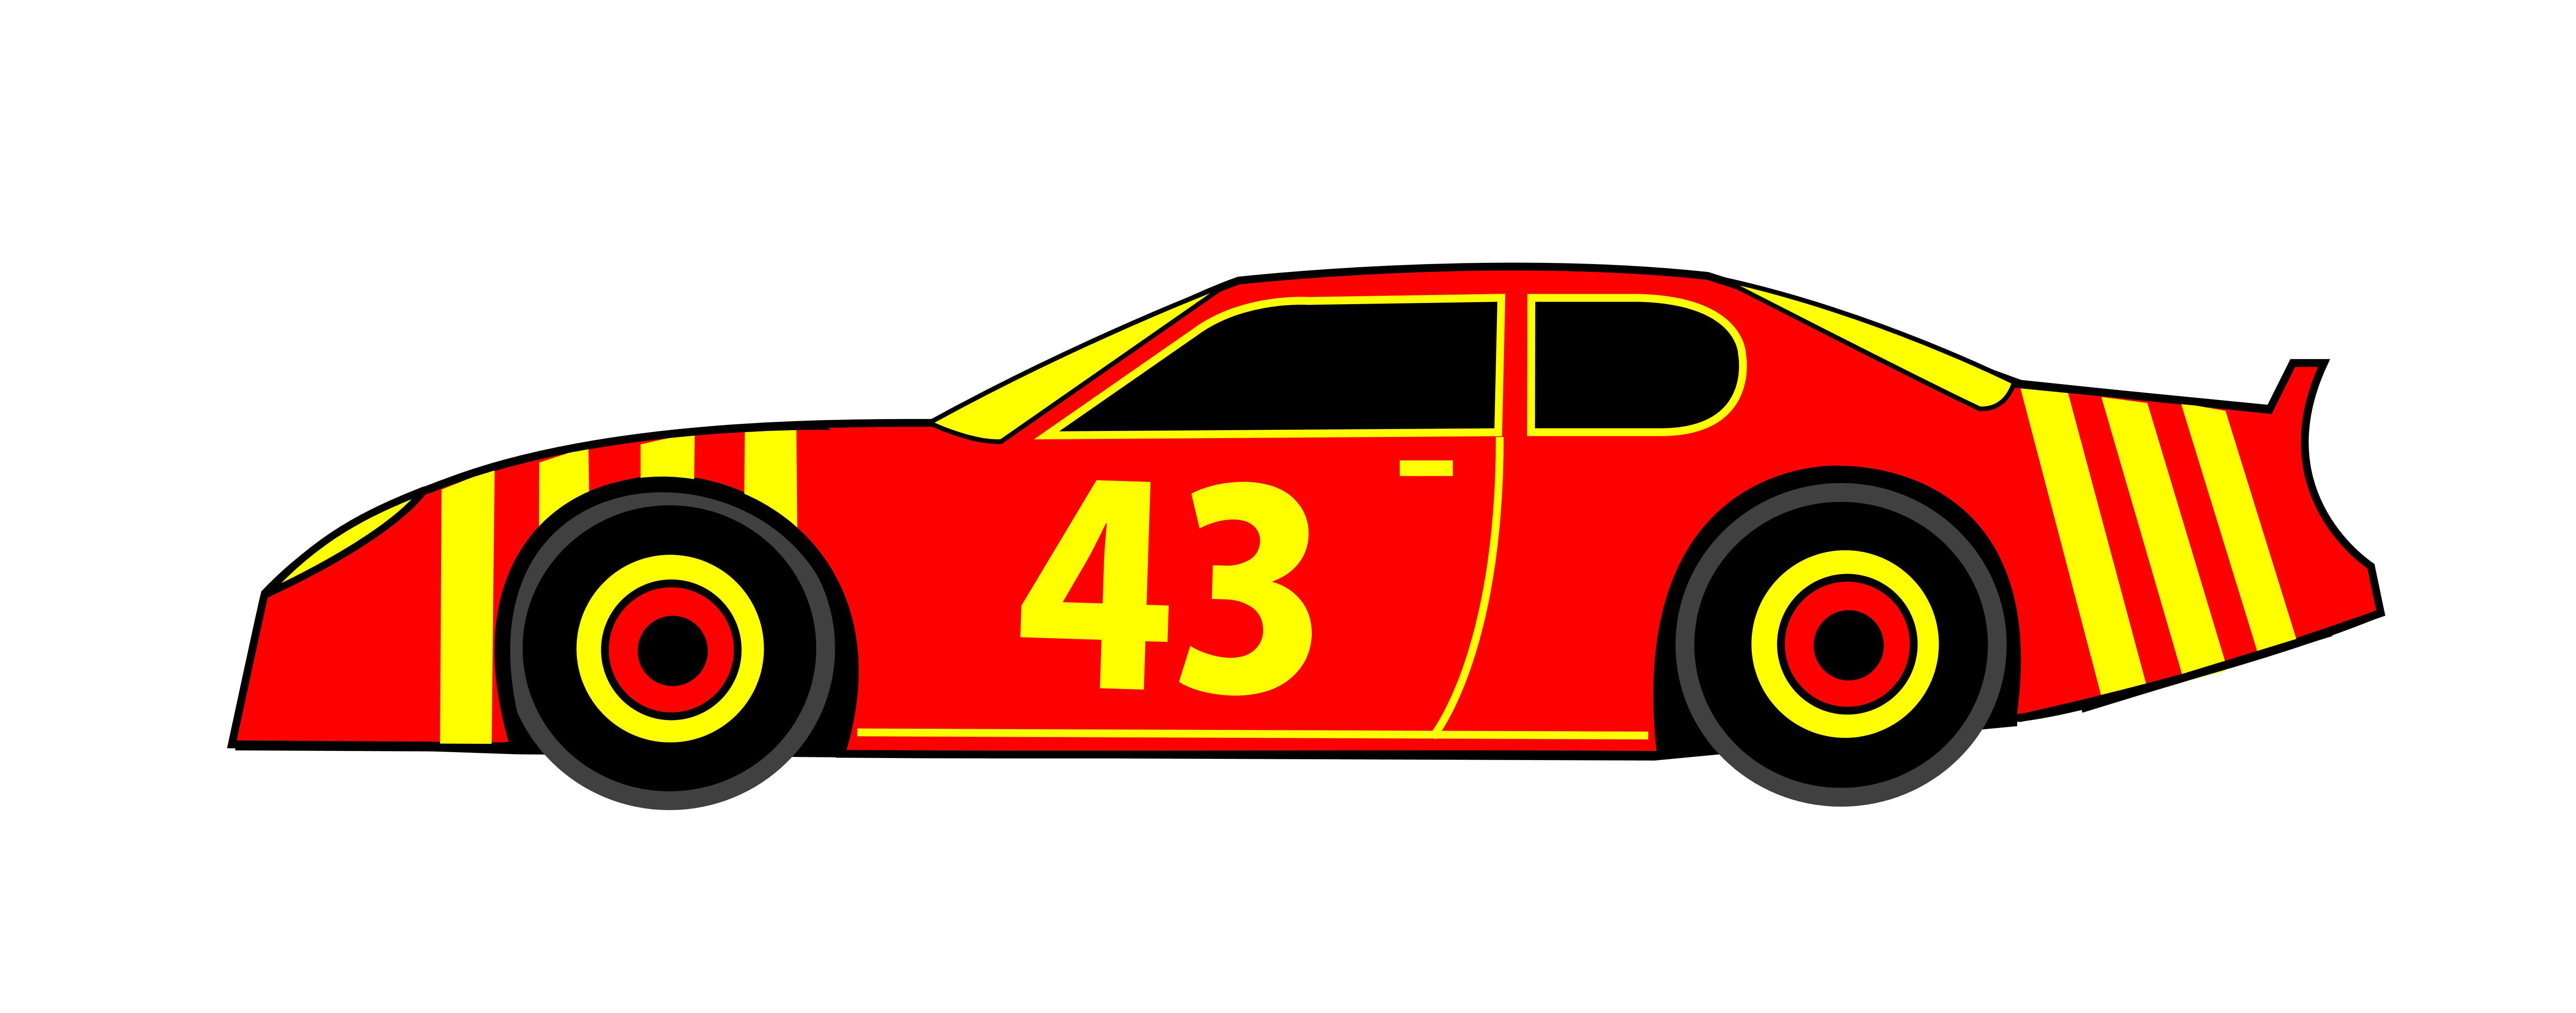 Children Race Car Clipart .-Children Race Car Clipart .-10